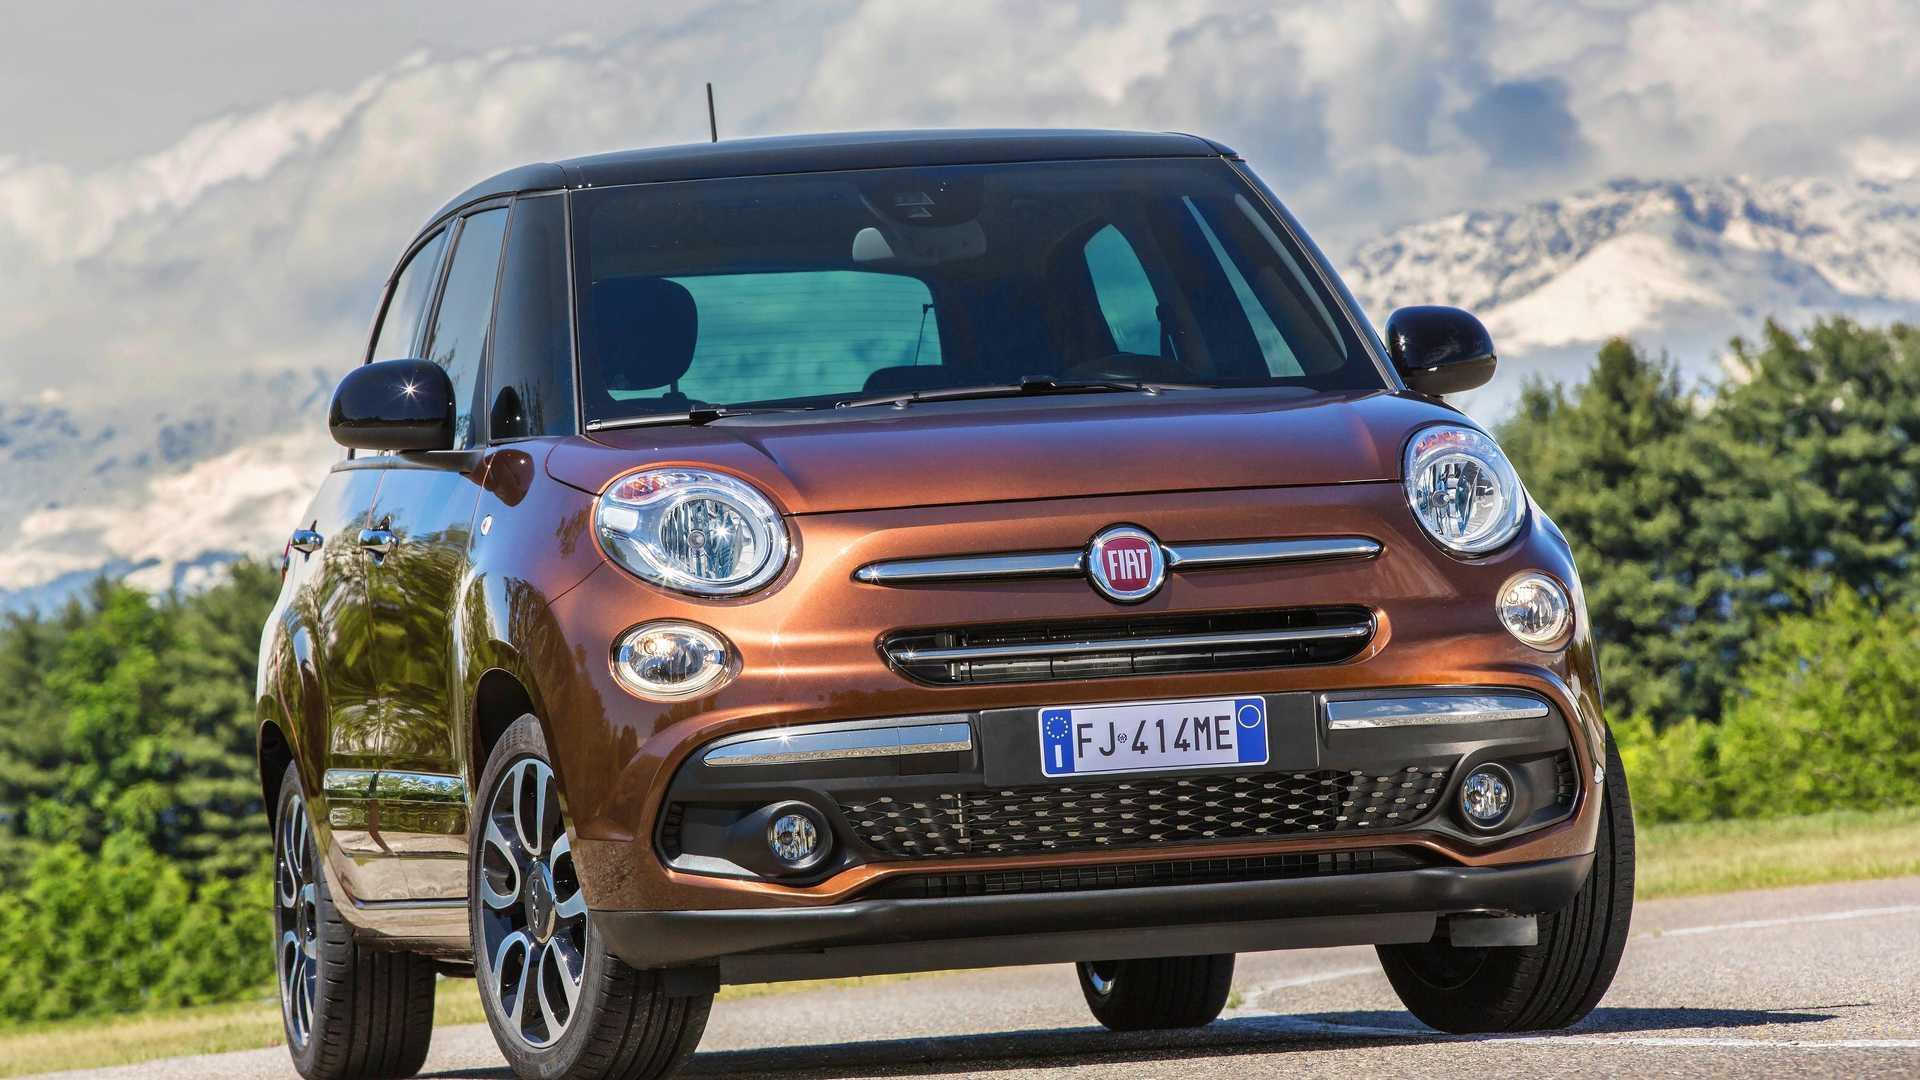 2018_Fiat_500L_facelift_04